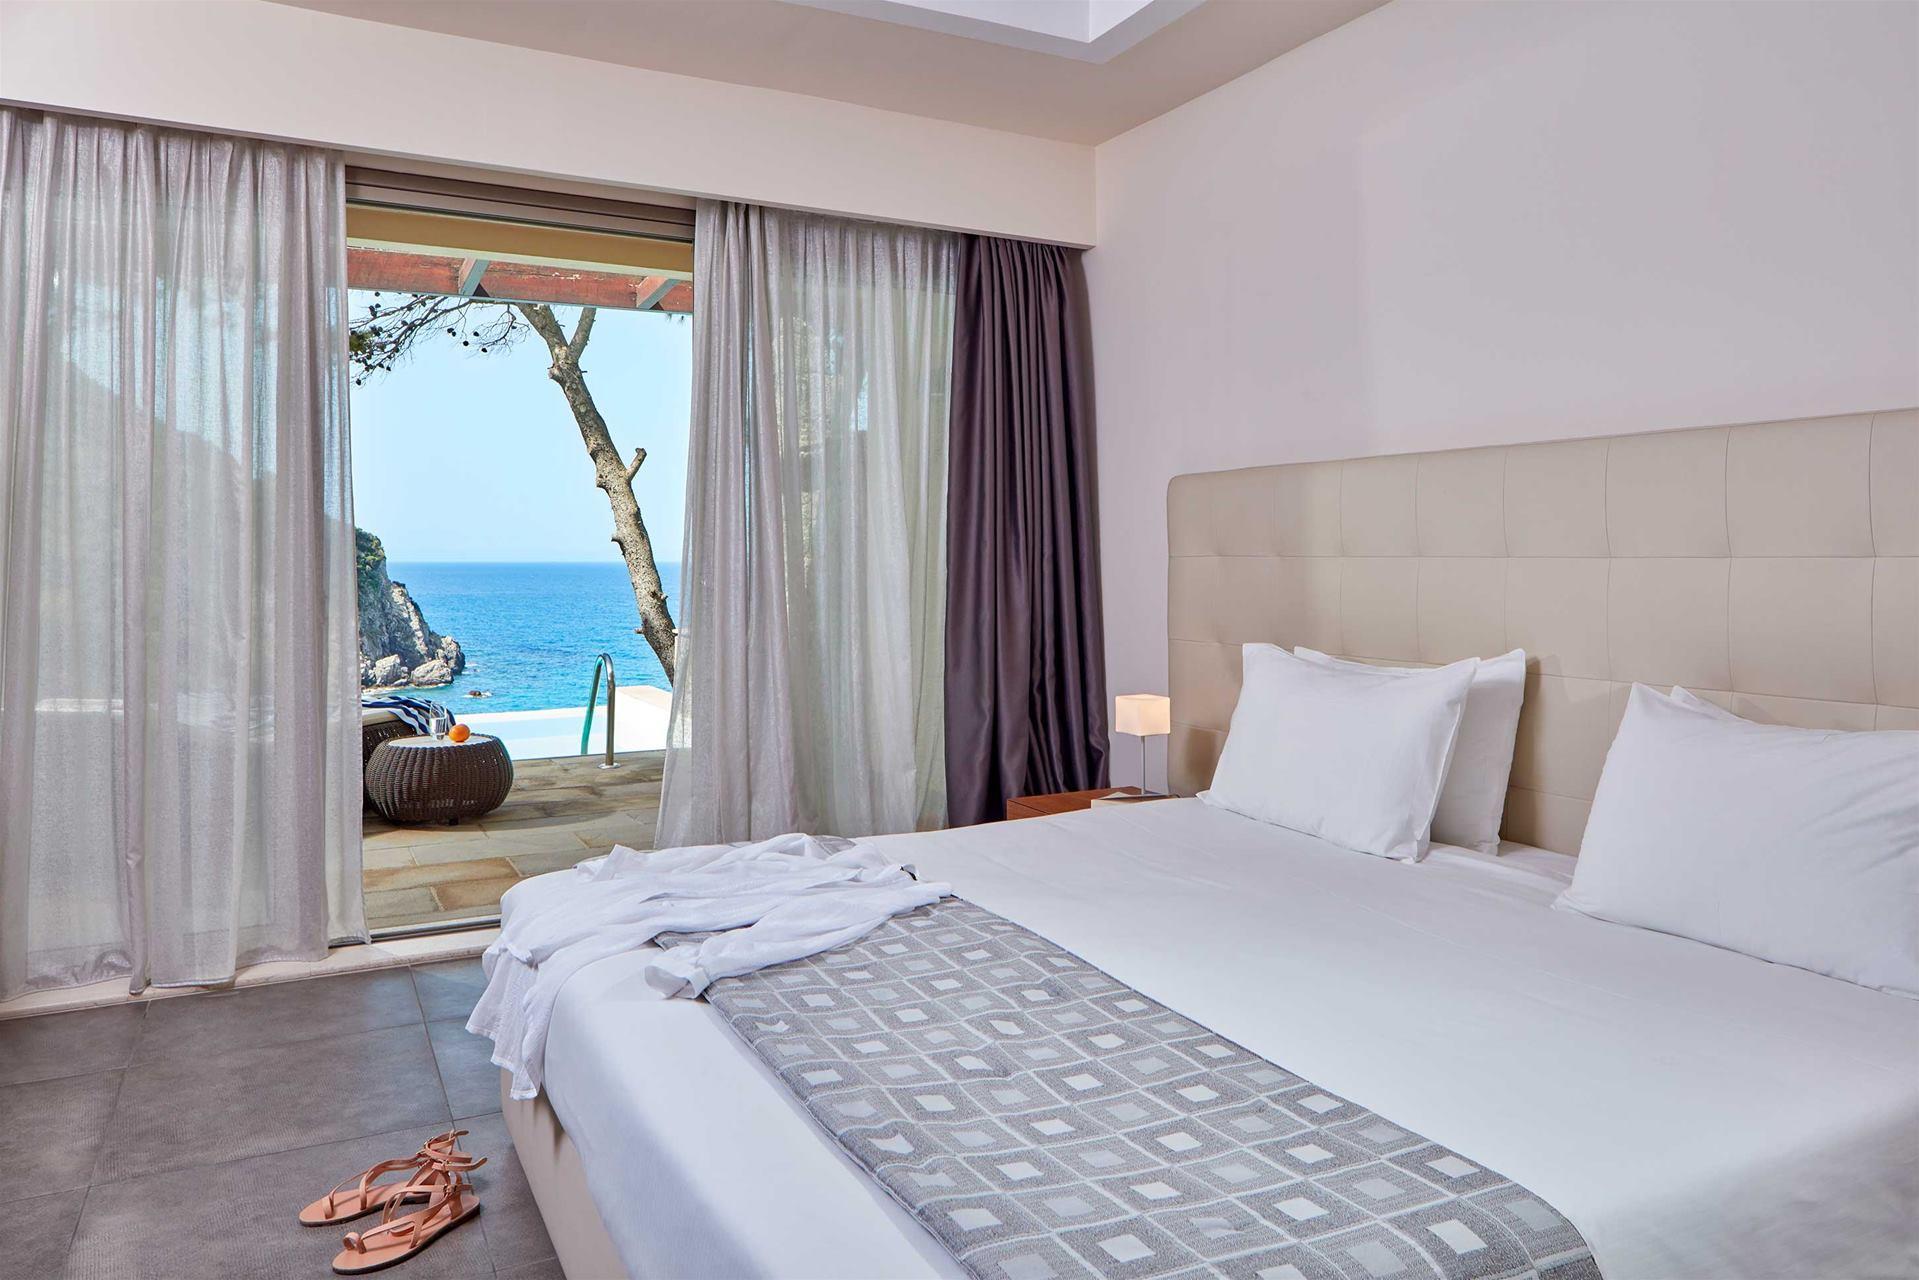 atlantica-grand-mediterraneo-resort-spa-genel-0015